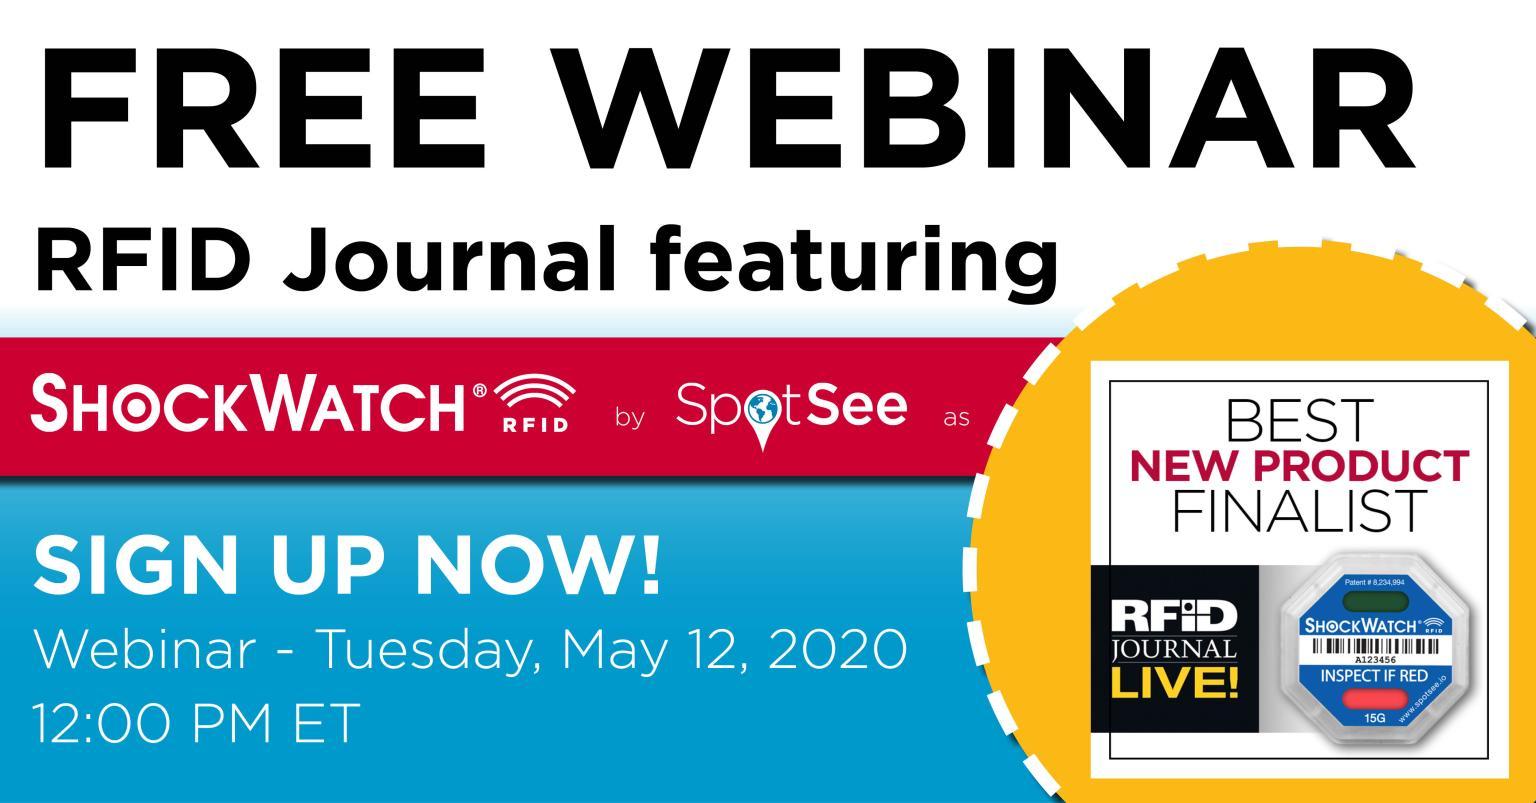 Free Webinar <br></noscript> RFID Journal featuring ShockWatch RFID by Spotsee